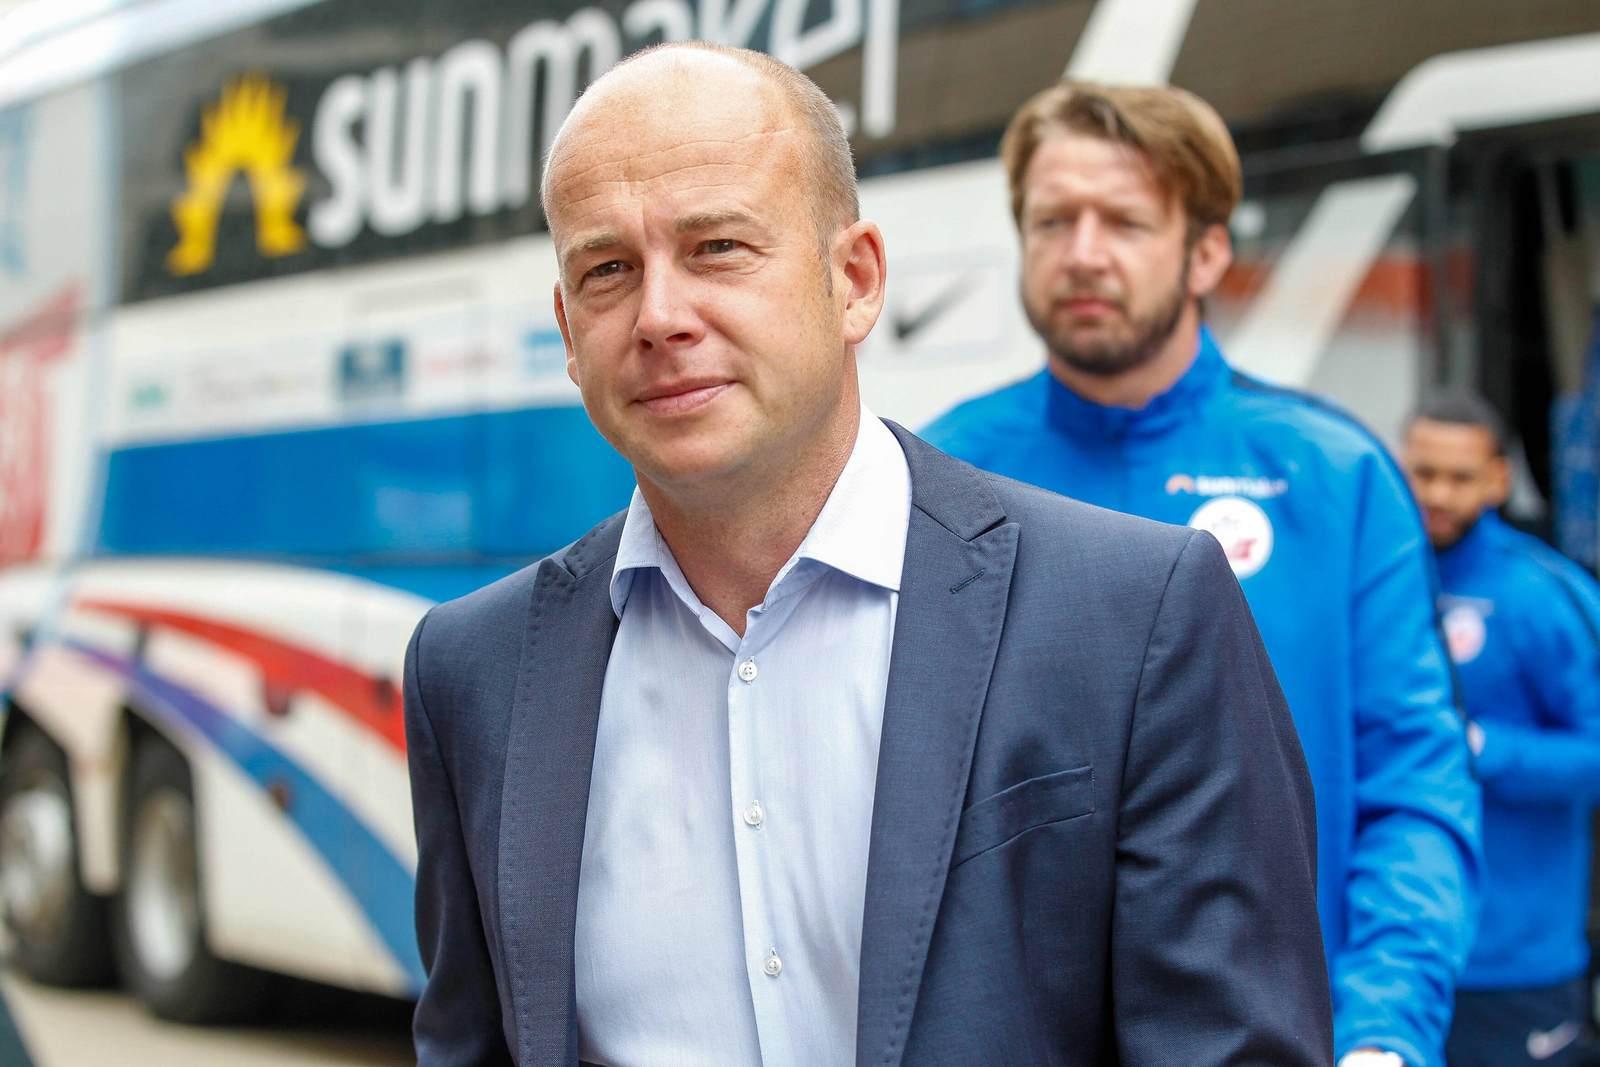 Markus Thiele verlässt den Bus des FC Hansa Rostock